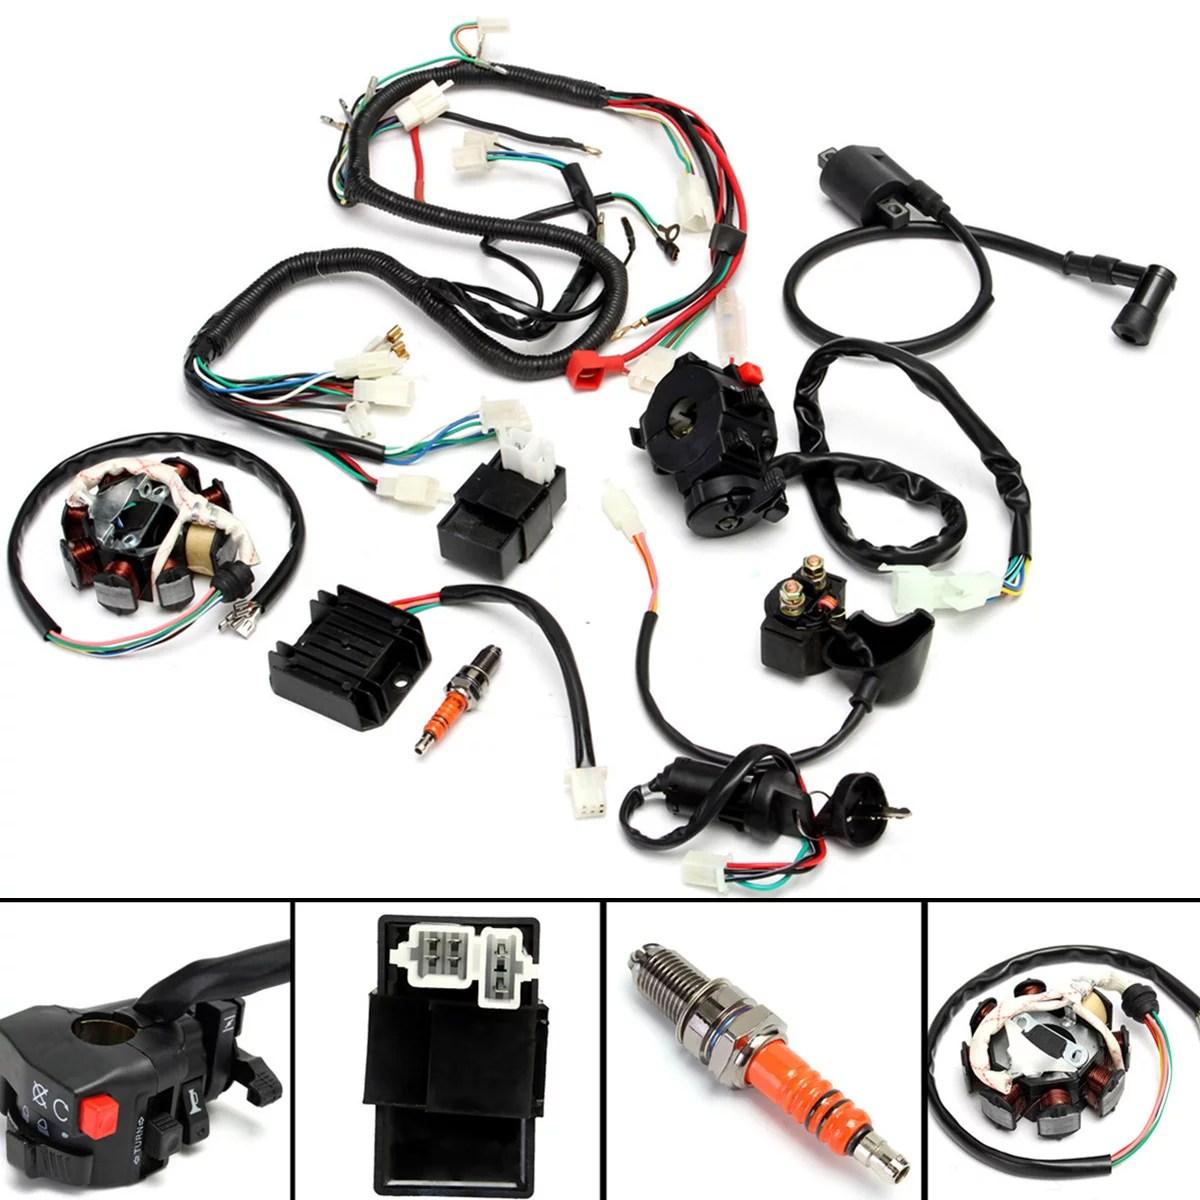 hight resolution of atv electrical wiring harness for chinese dirt bike atv quad 150 250 300cc walmart com